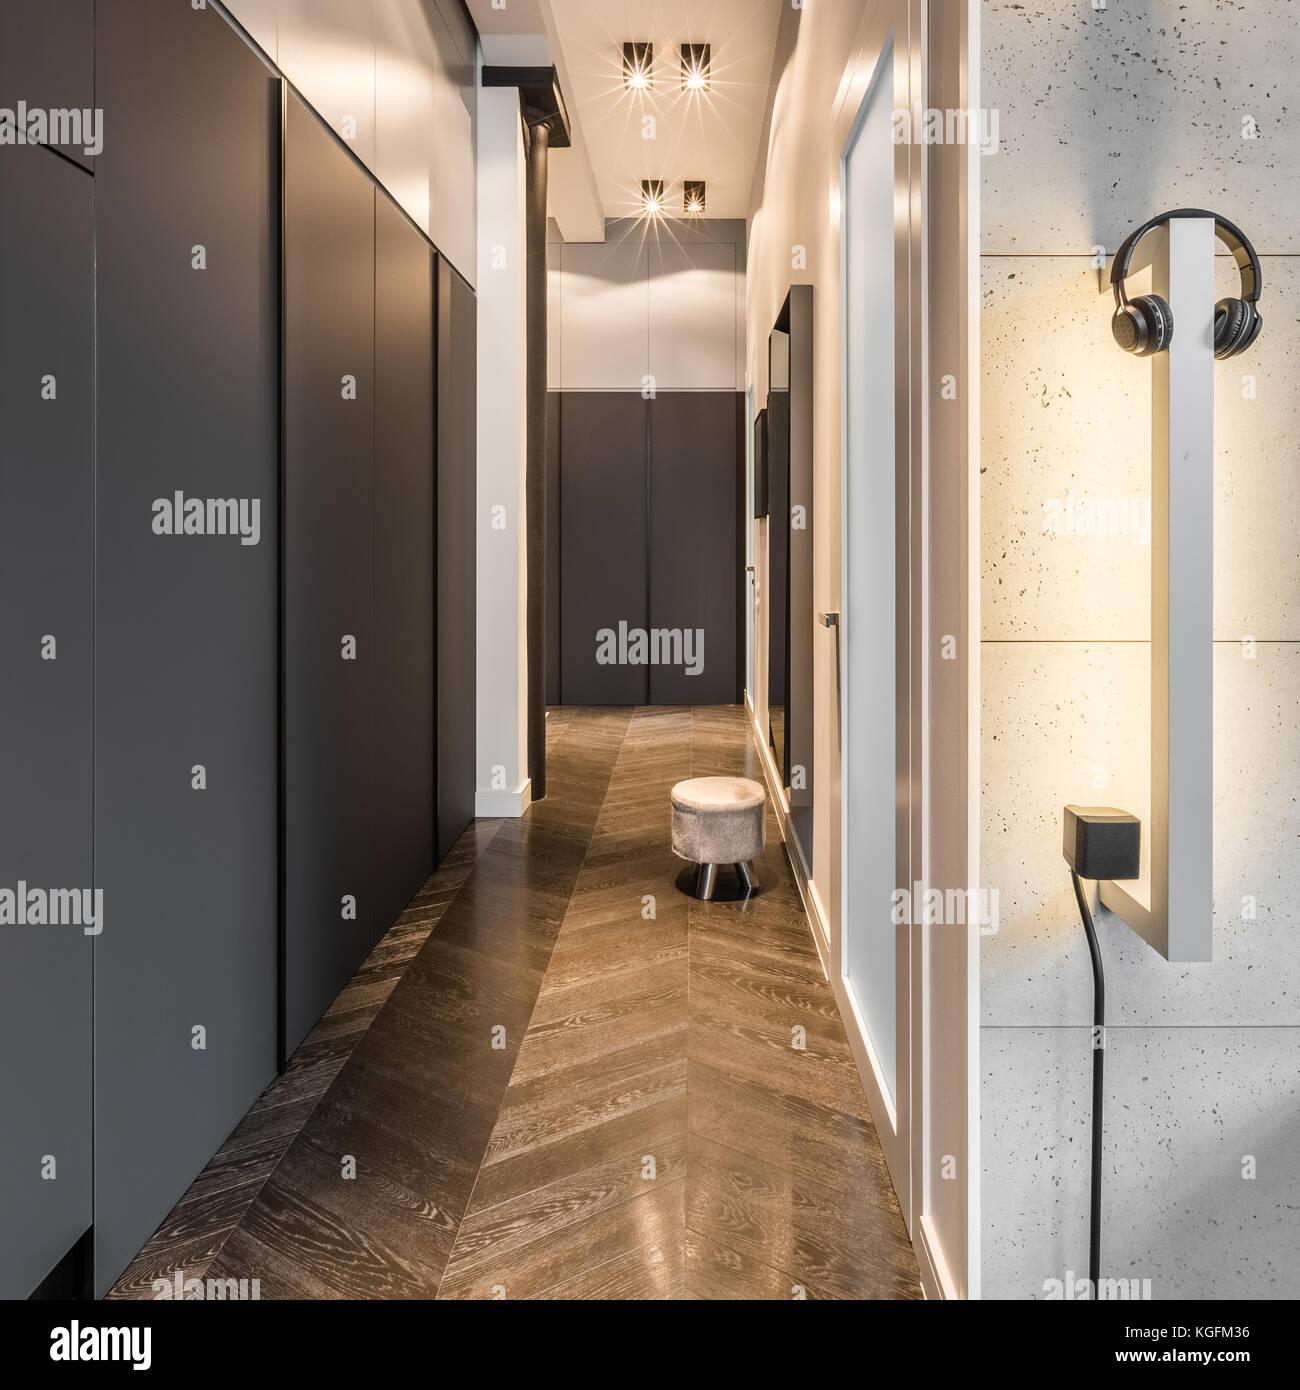 Corridor Design Ceiling: Wood Panels Wall Lights Stock Photos & Wood Panels Wall